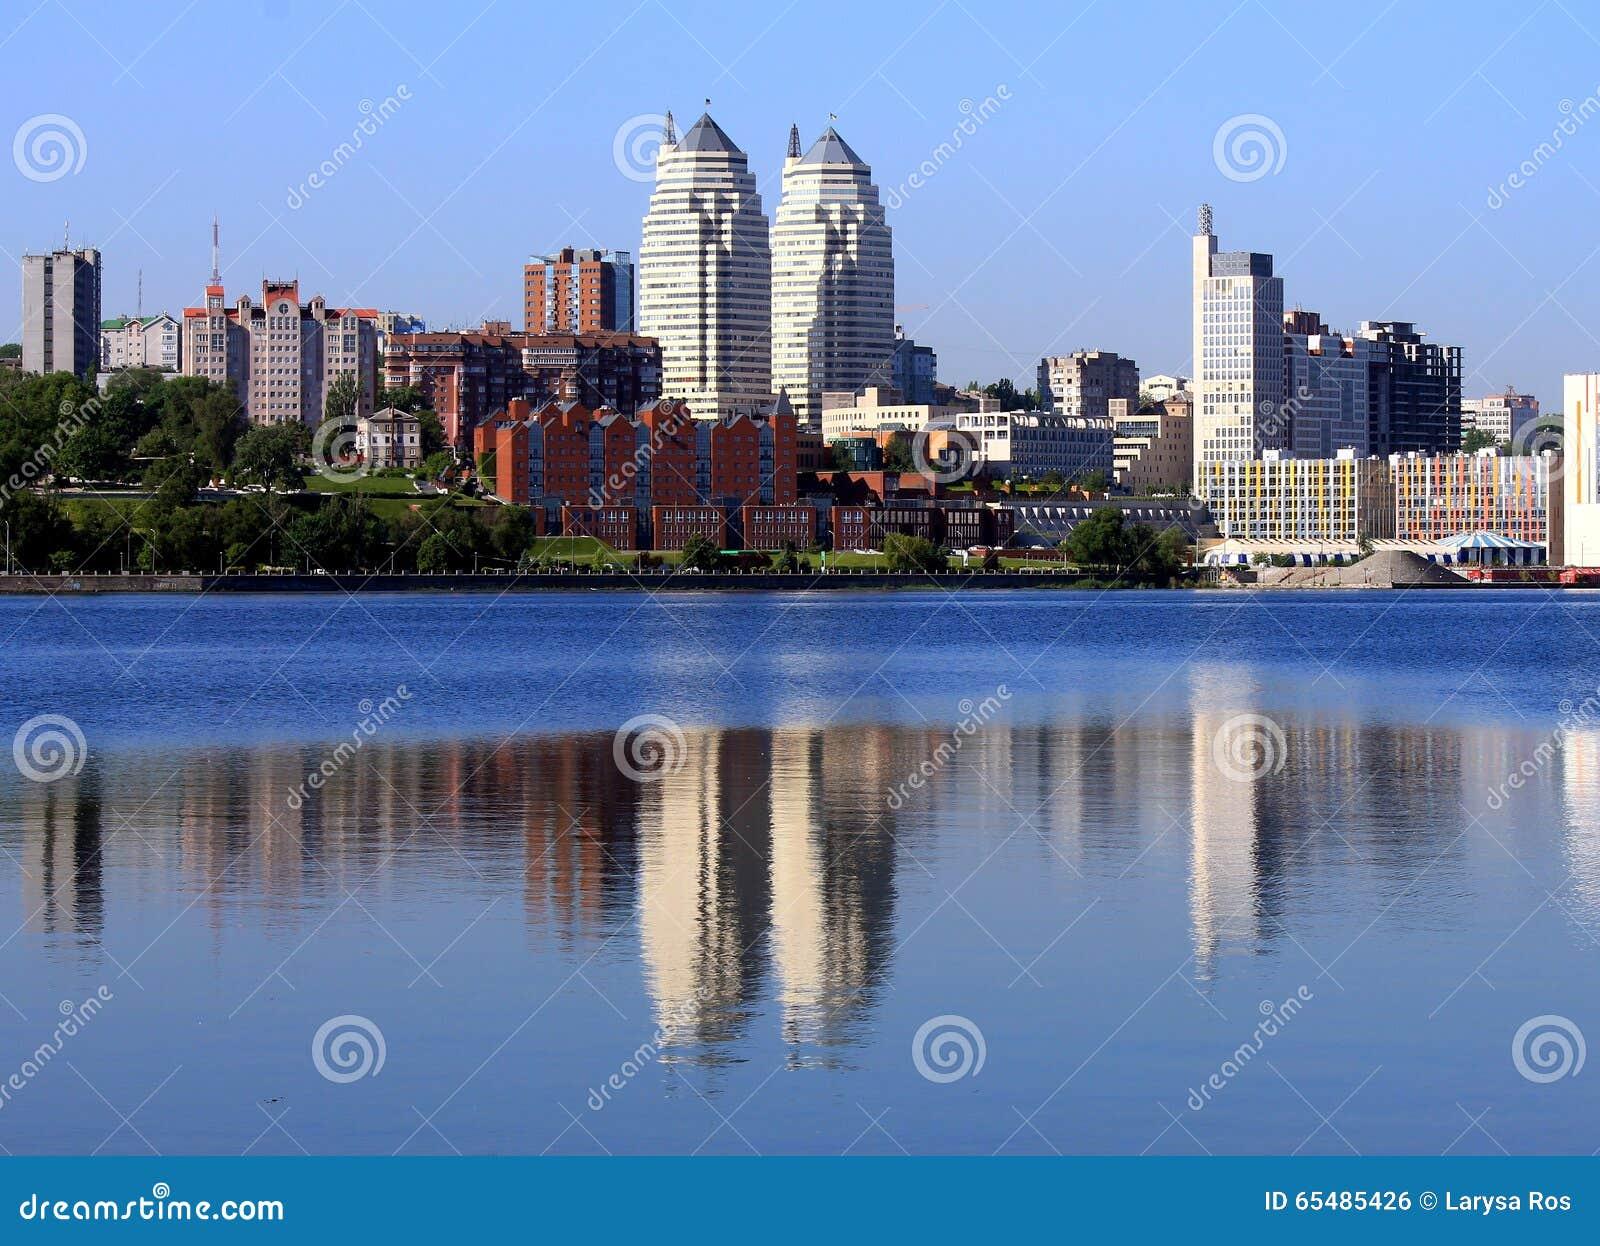 Otta på floden Dnieper, Dnepropetrovsk, Ukraina